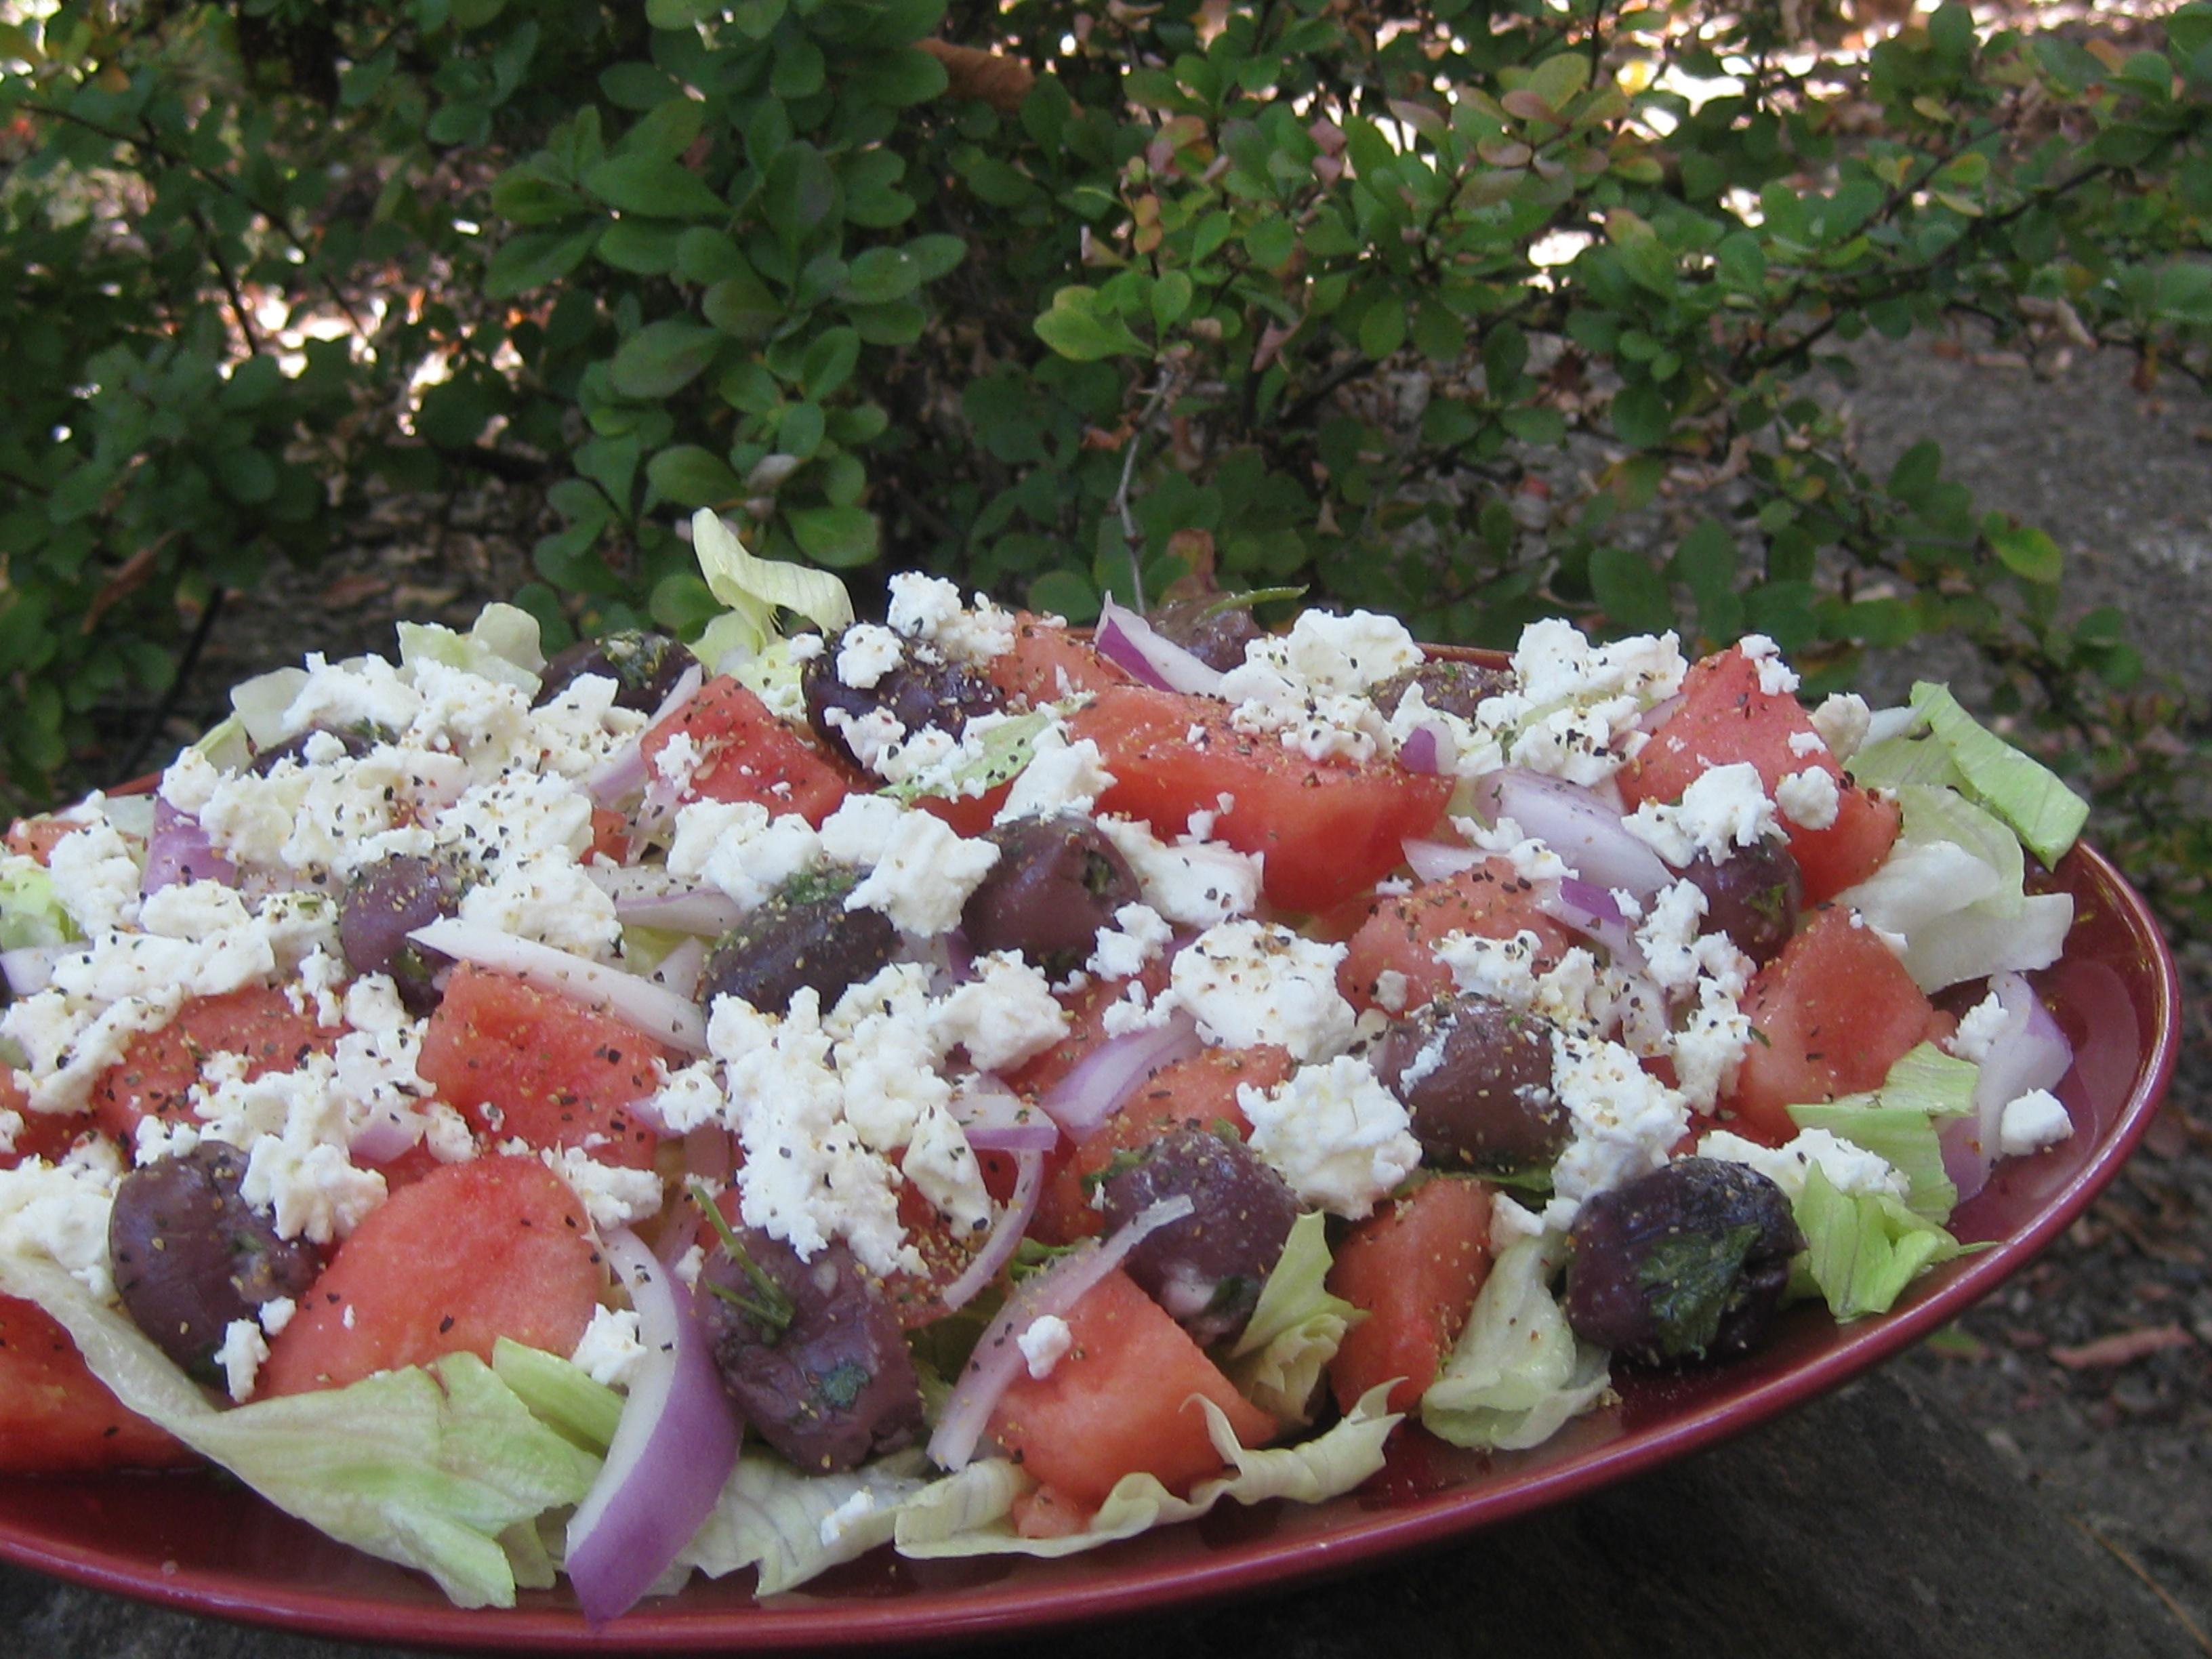 Mediterranean Watermelon Salad with Watermelon Vinaigrette